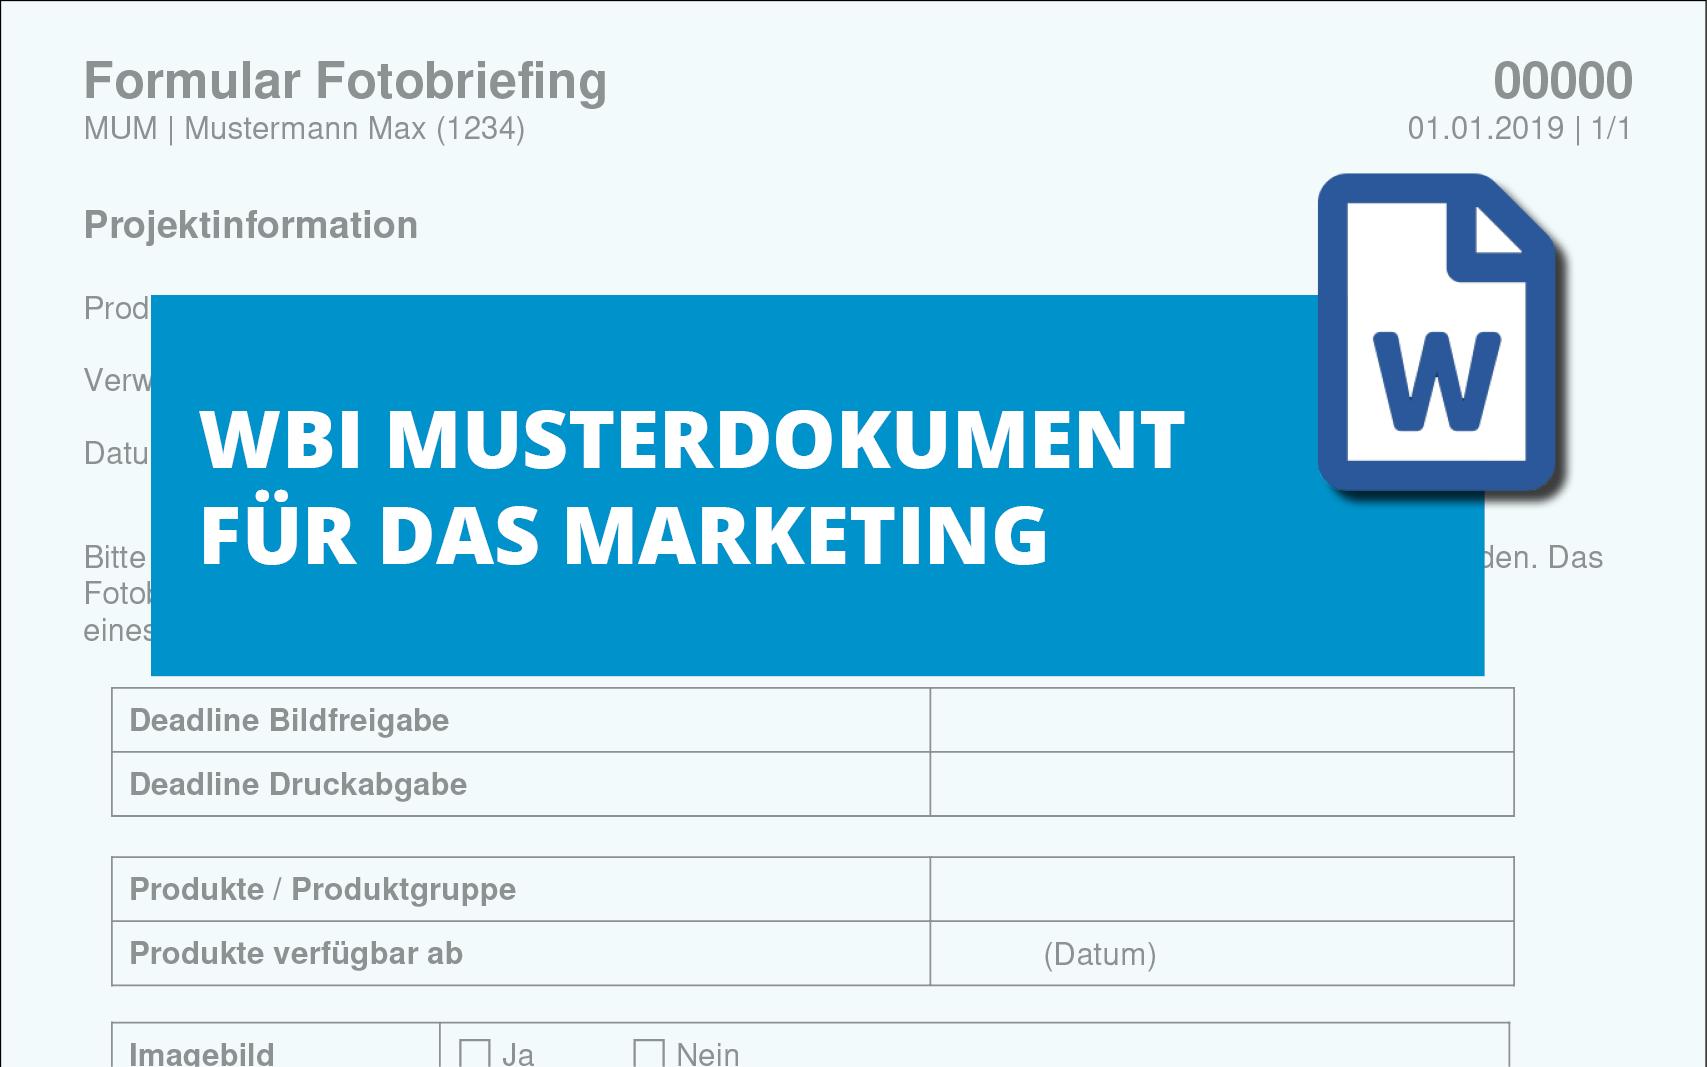 formular-fotobriefing